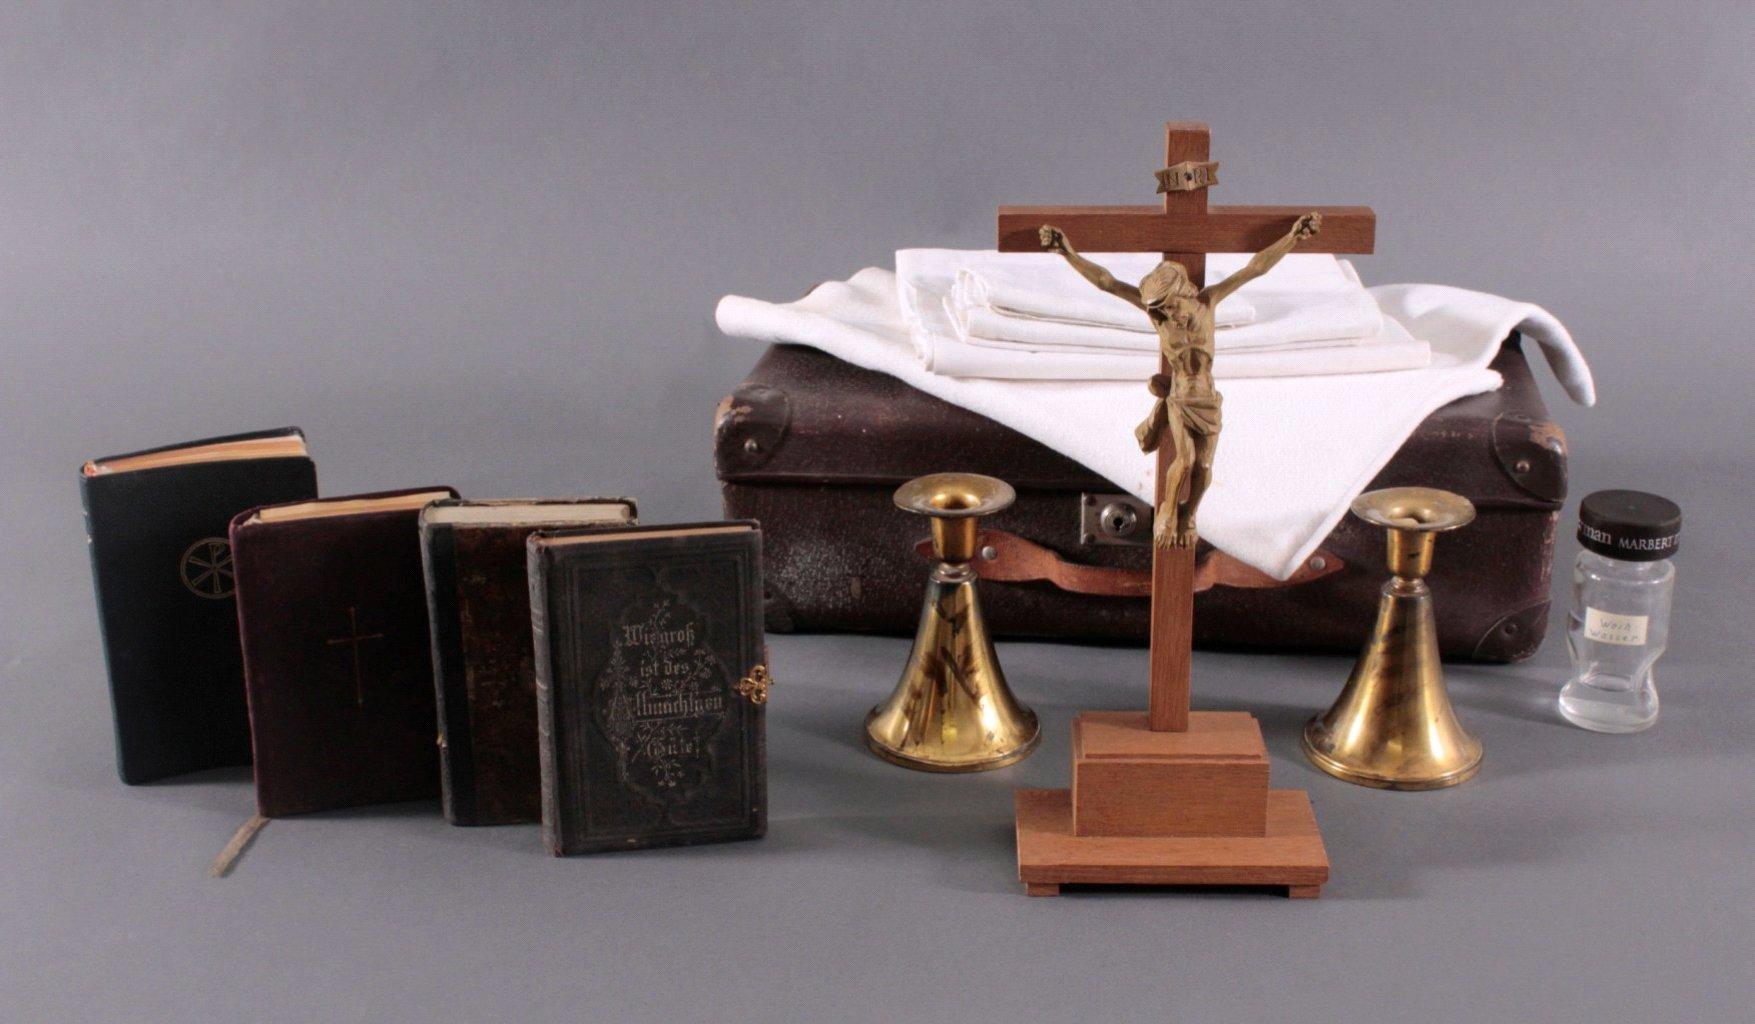 Lederkoffer mit sakralen Objekten-1